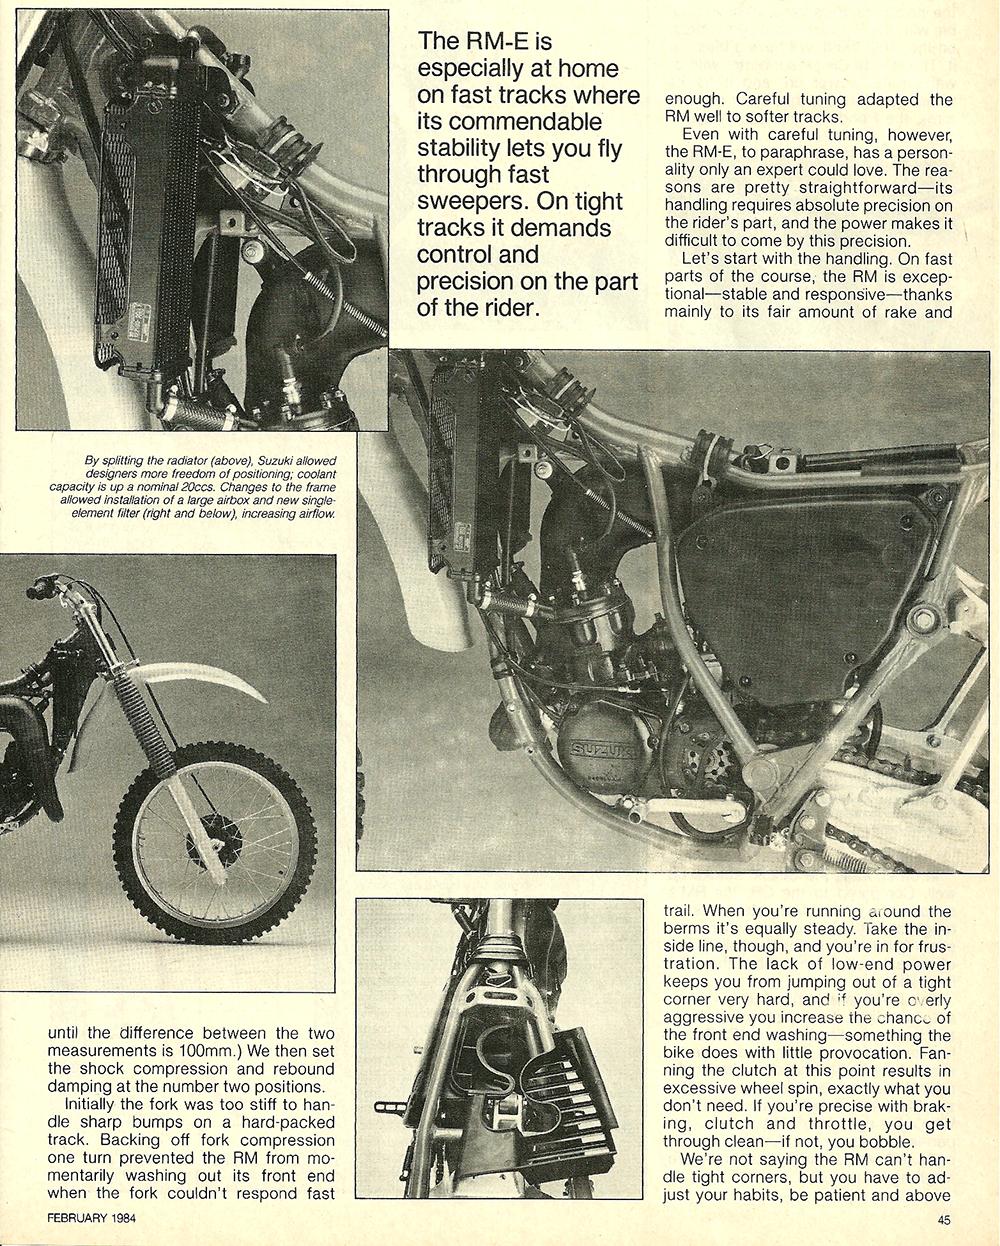 1984 Suzuki RM125E road test 6.jpg